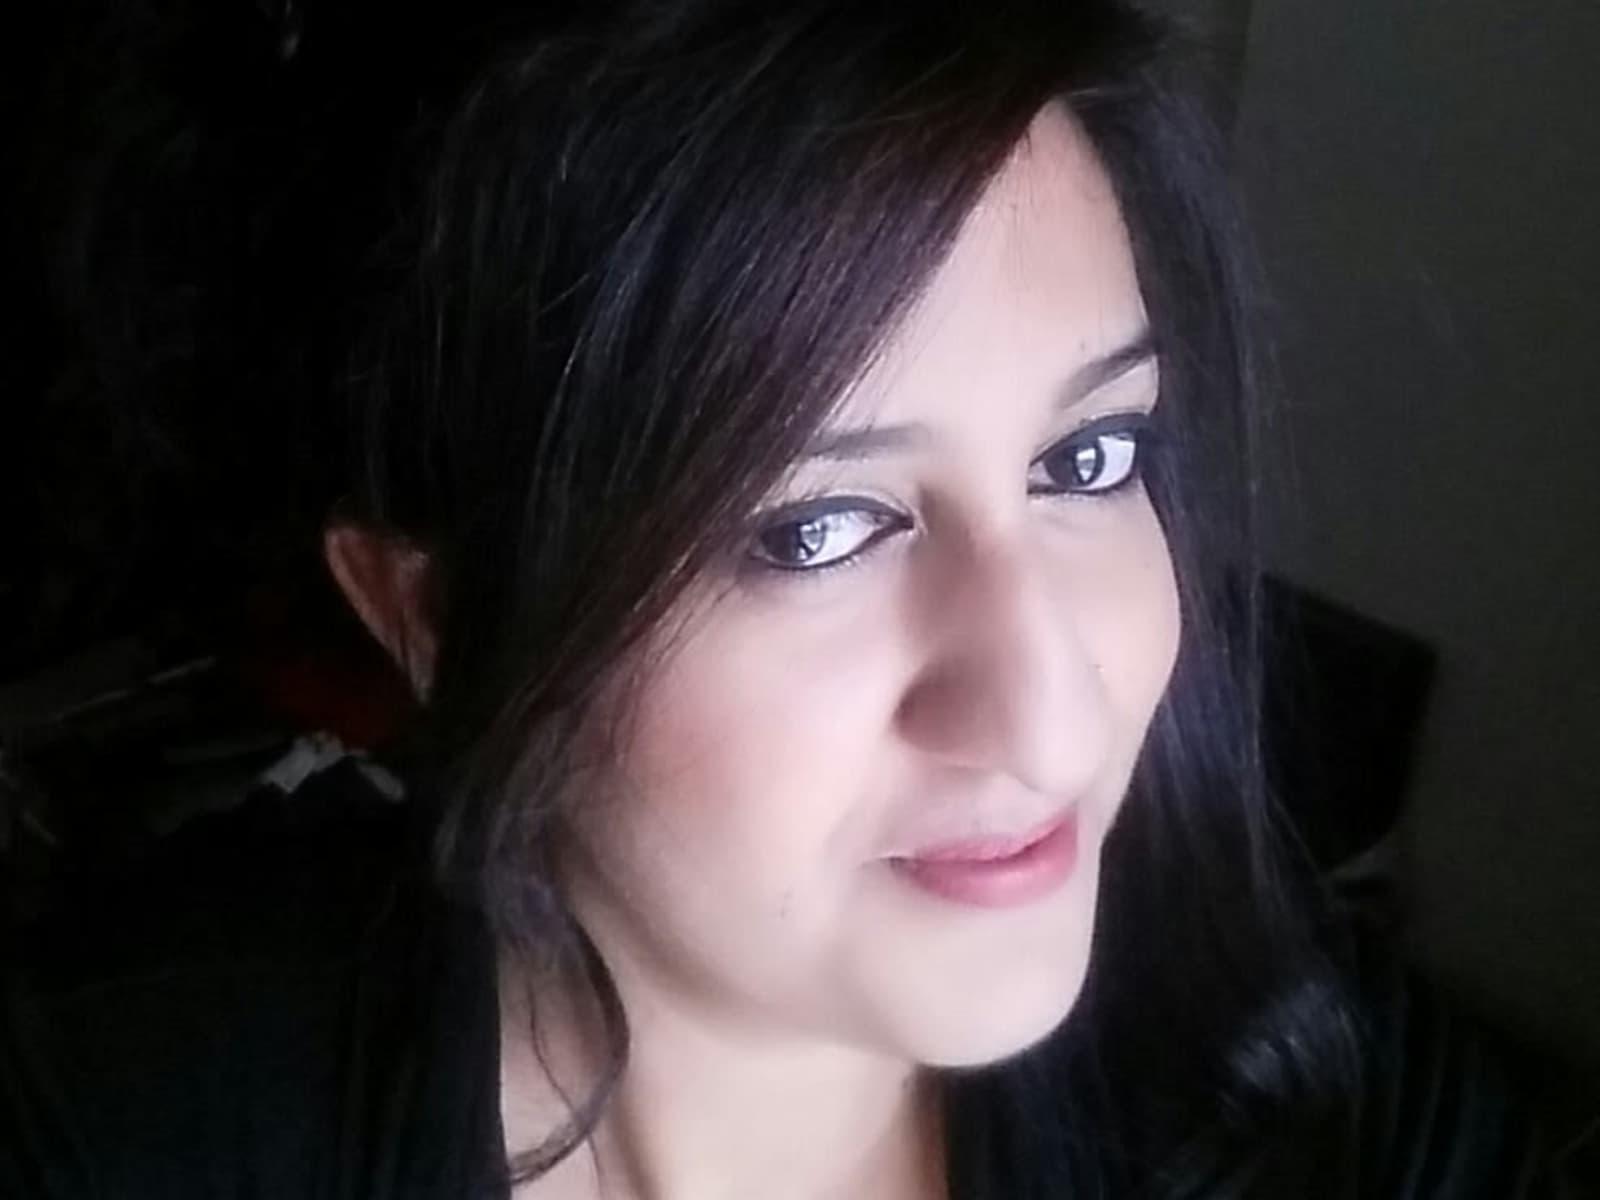 Huma from Dubai International Financial Centre, United Arab Emirates